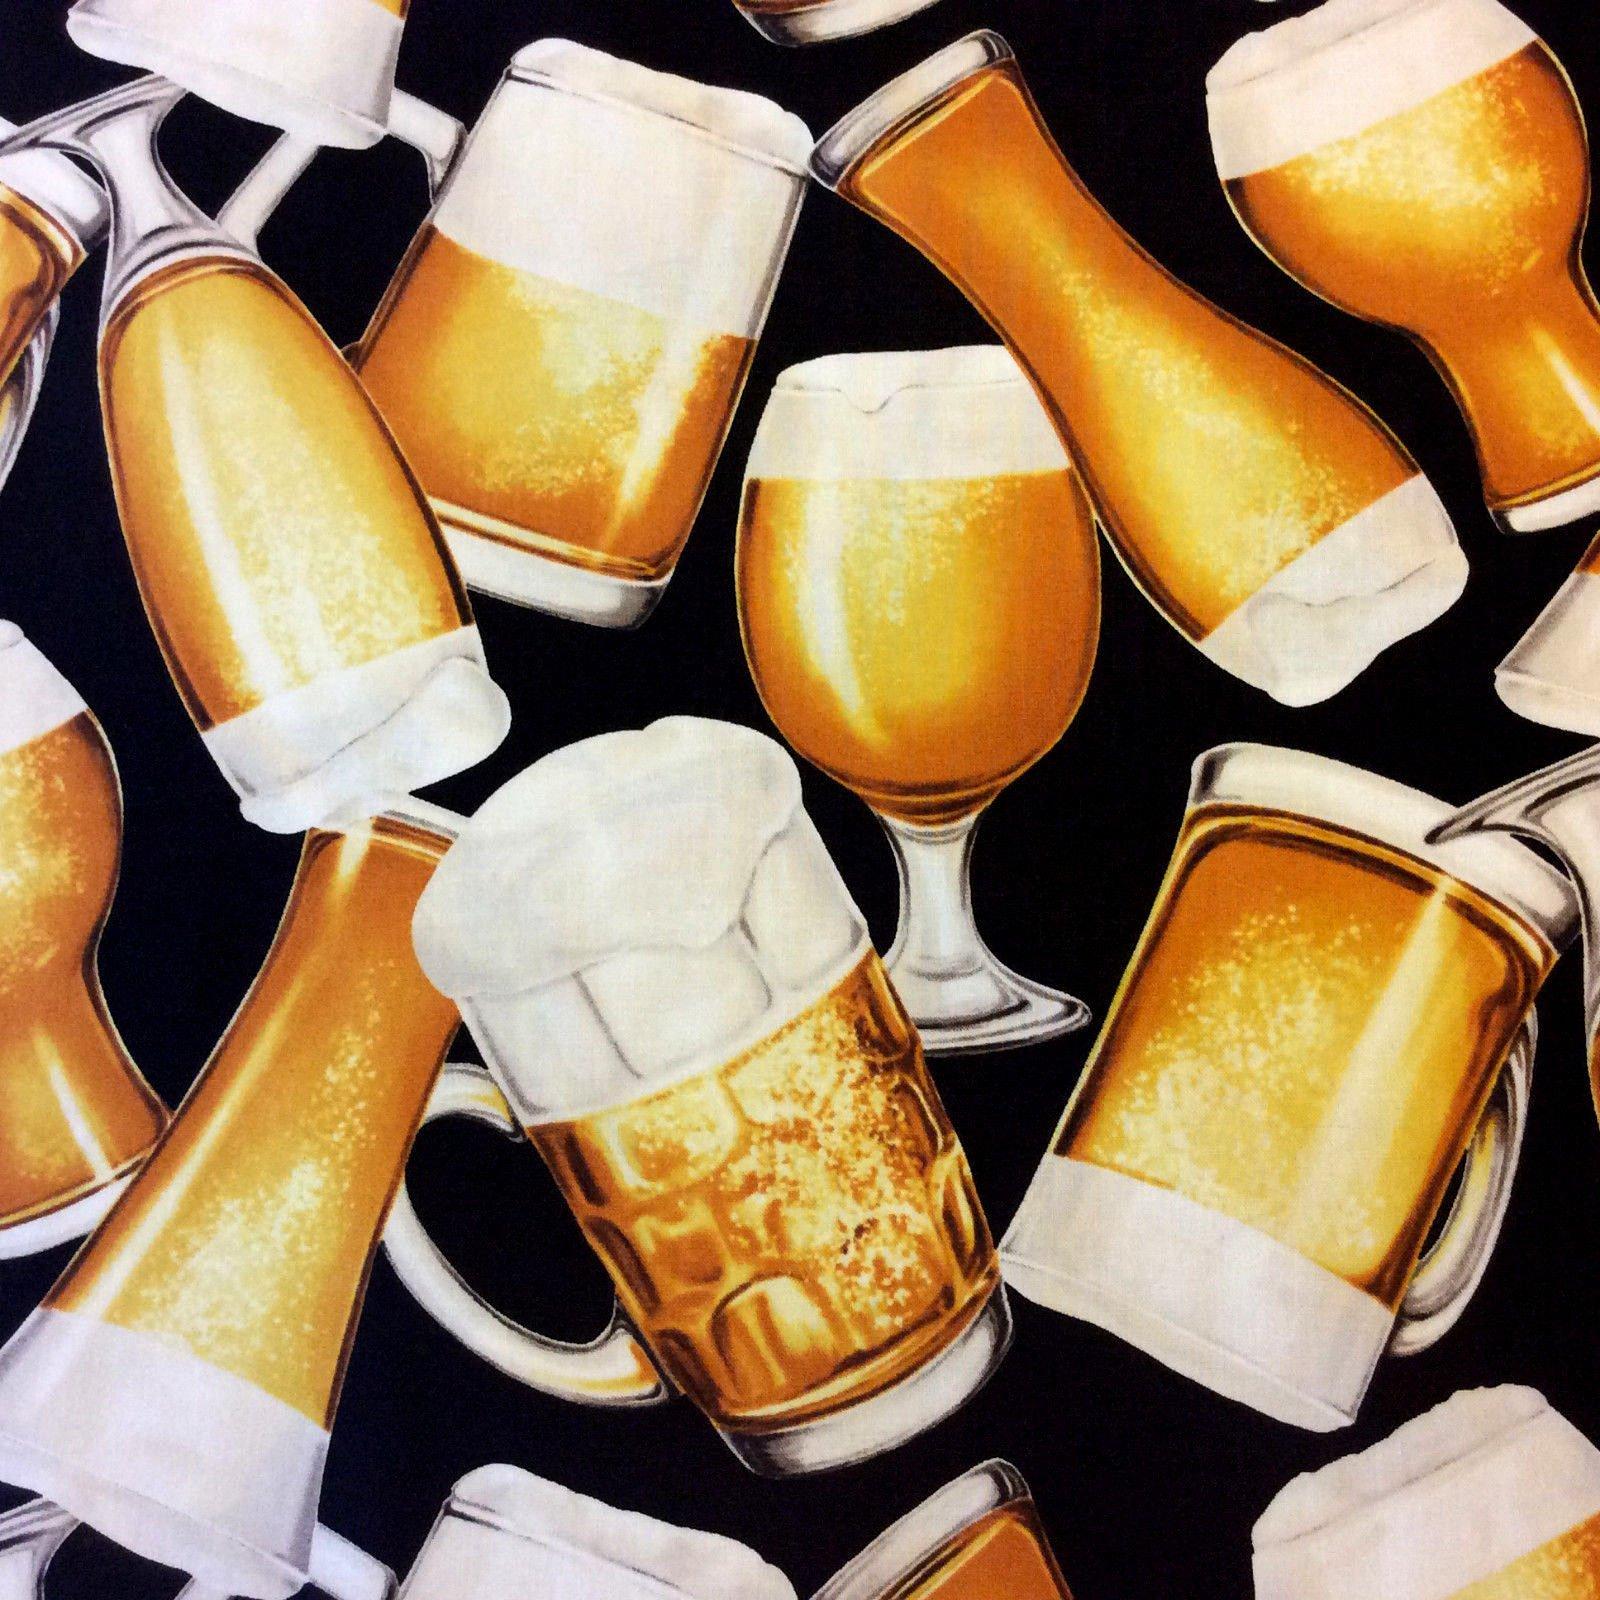 Draft Beer Mug Glass Craft Brew Drink Lager Restaurant Cotton Quilt Fabric NC11